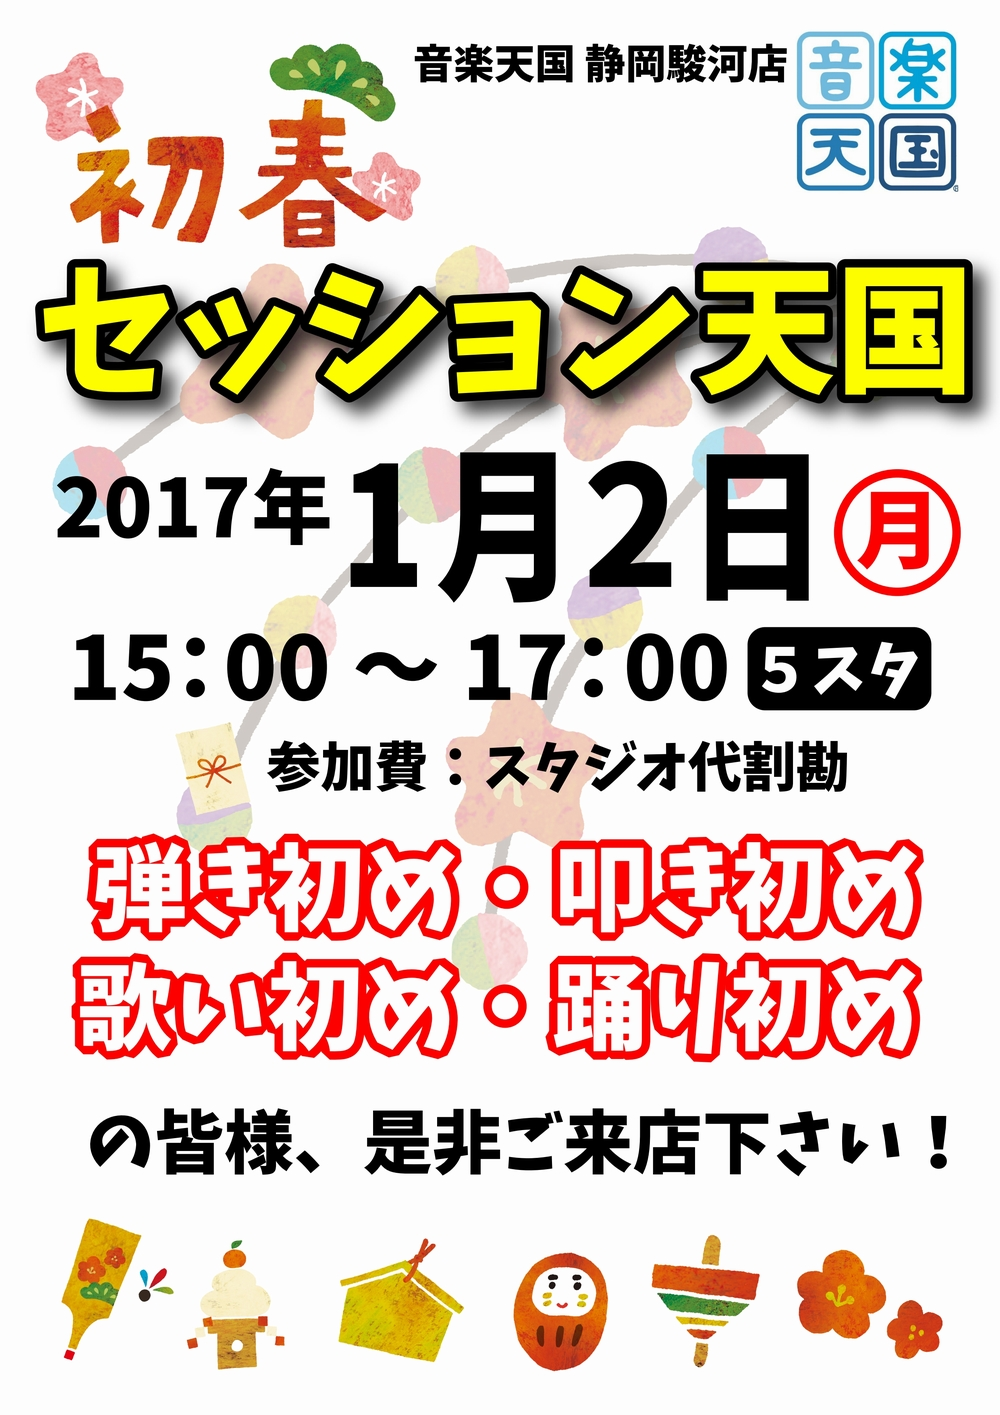 【新春・セッション天国】音楽天国・静岡駿河店1月2日(祝)開催